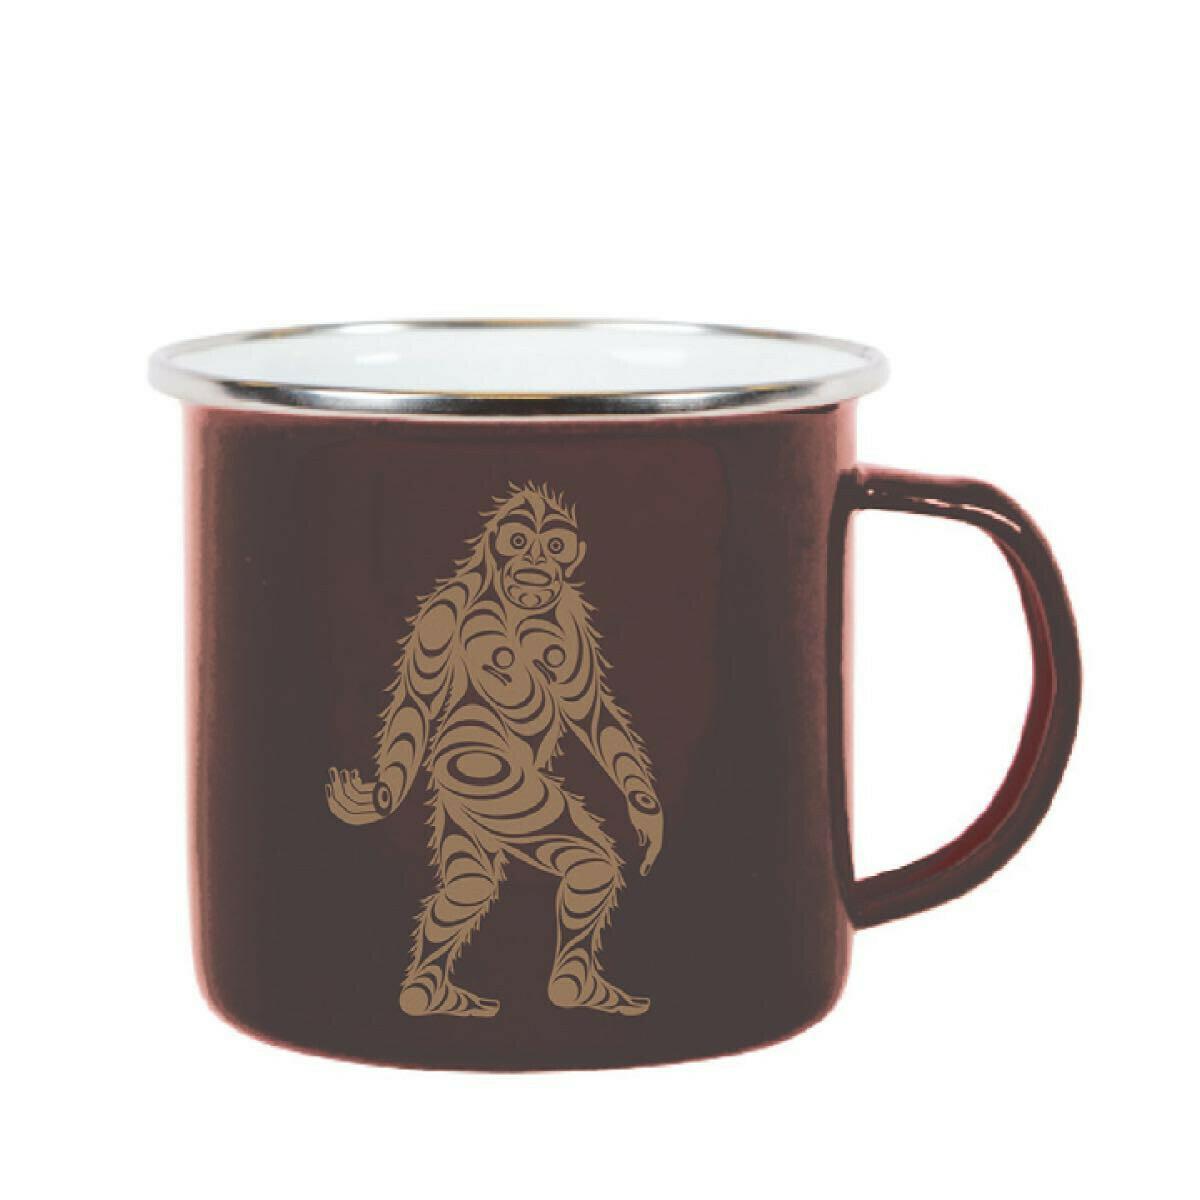 Enamel Mug - Sasquatch